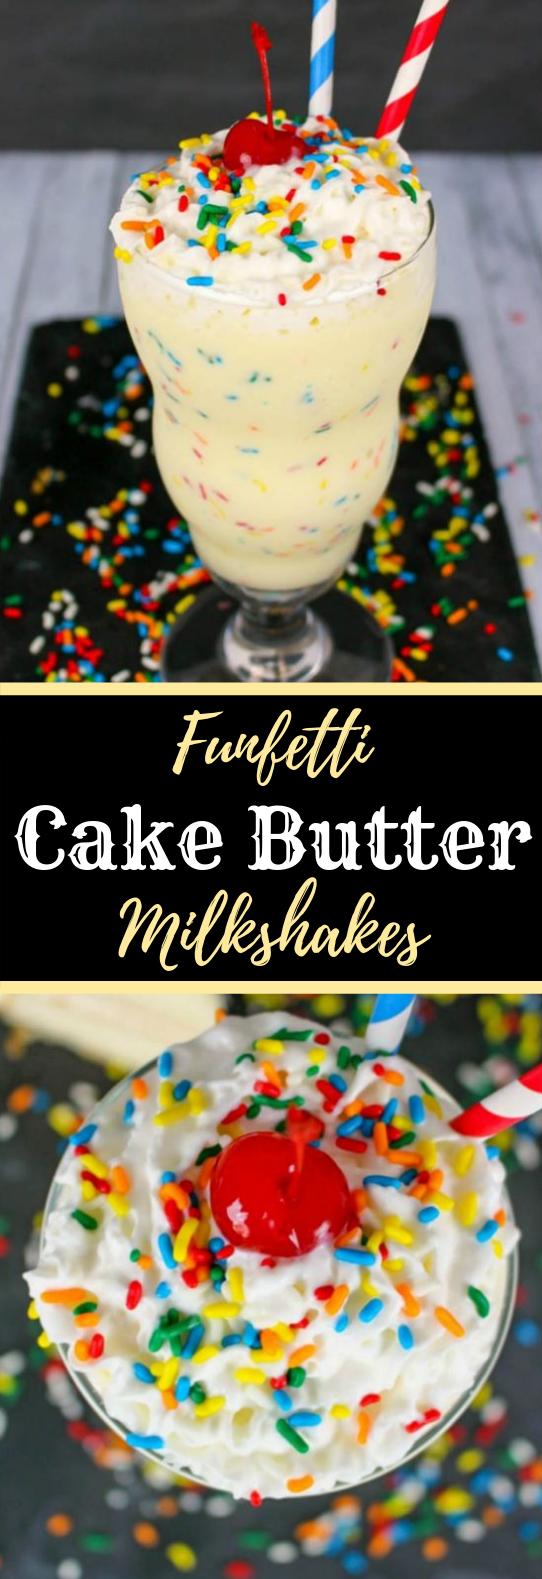 FUNFETTI CAKE BATTER MILKSHAKE RECIPE #Milk #Summer